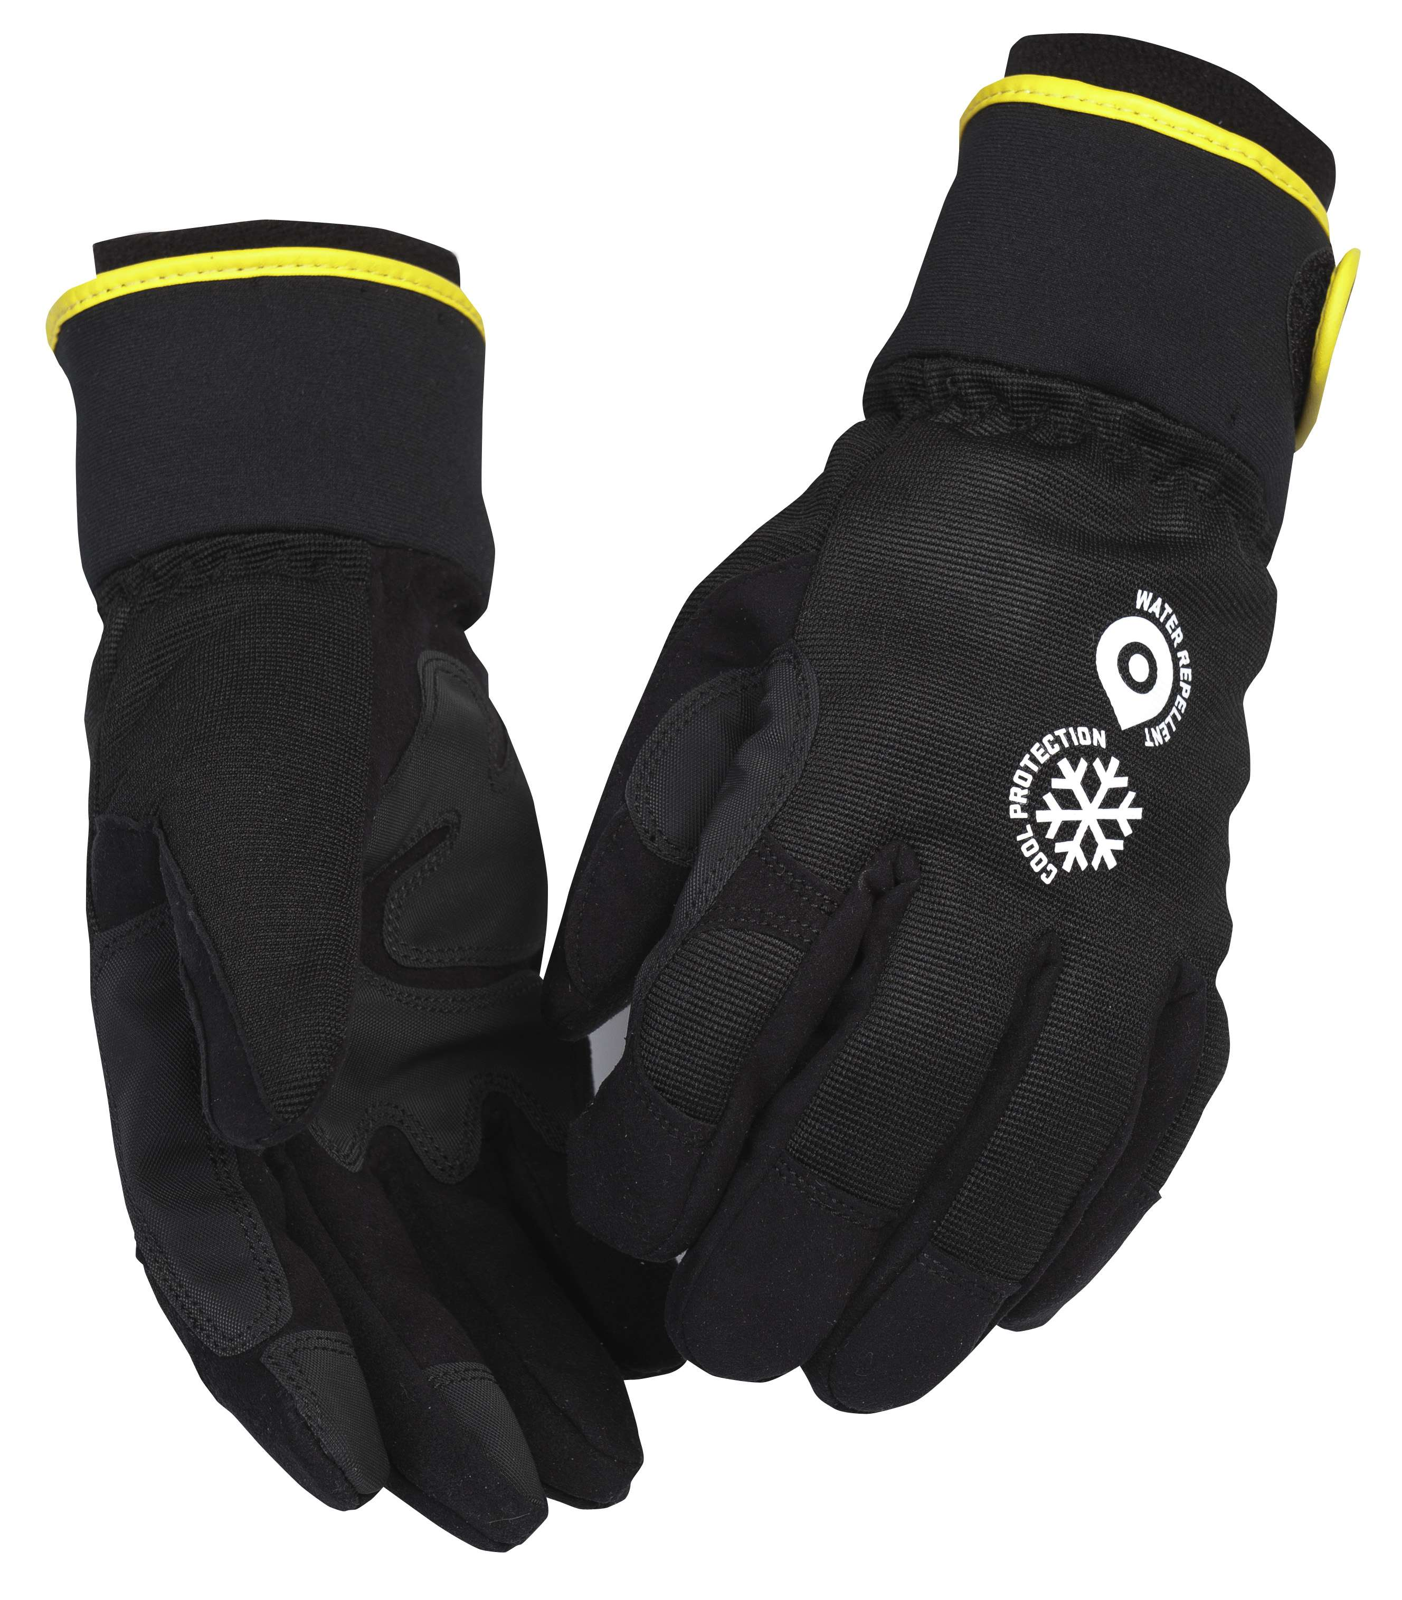 Blaklader Werkhandschoenen 22483943 zwart-grijs(9994)